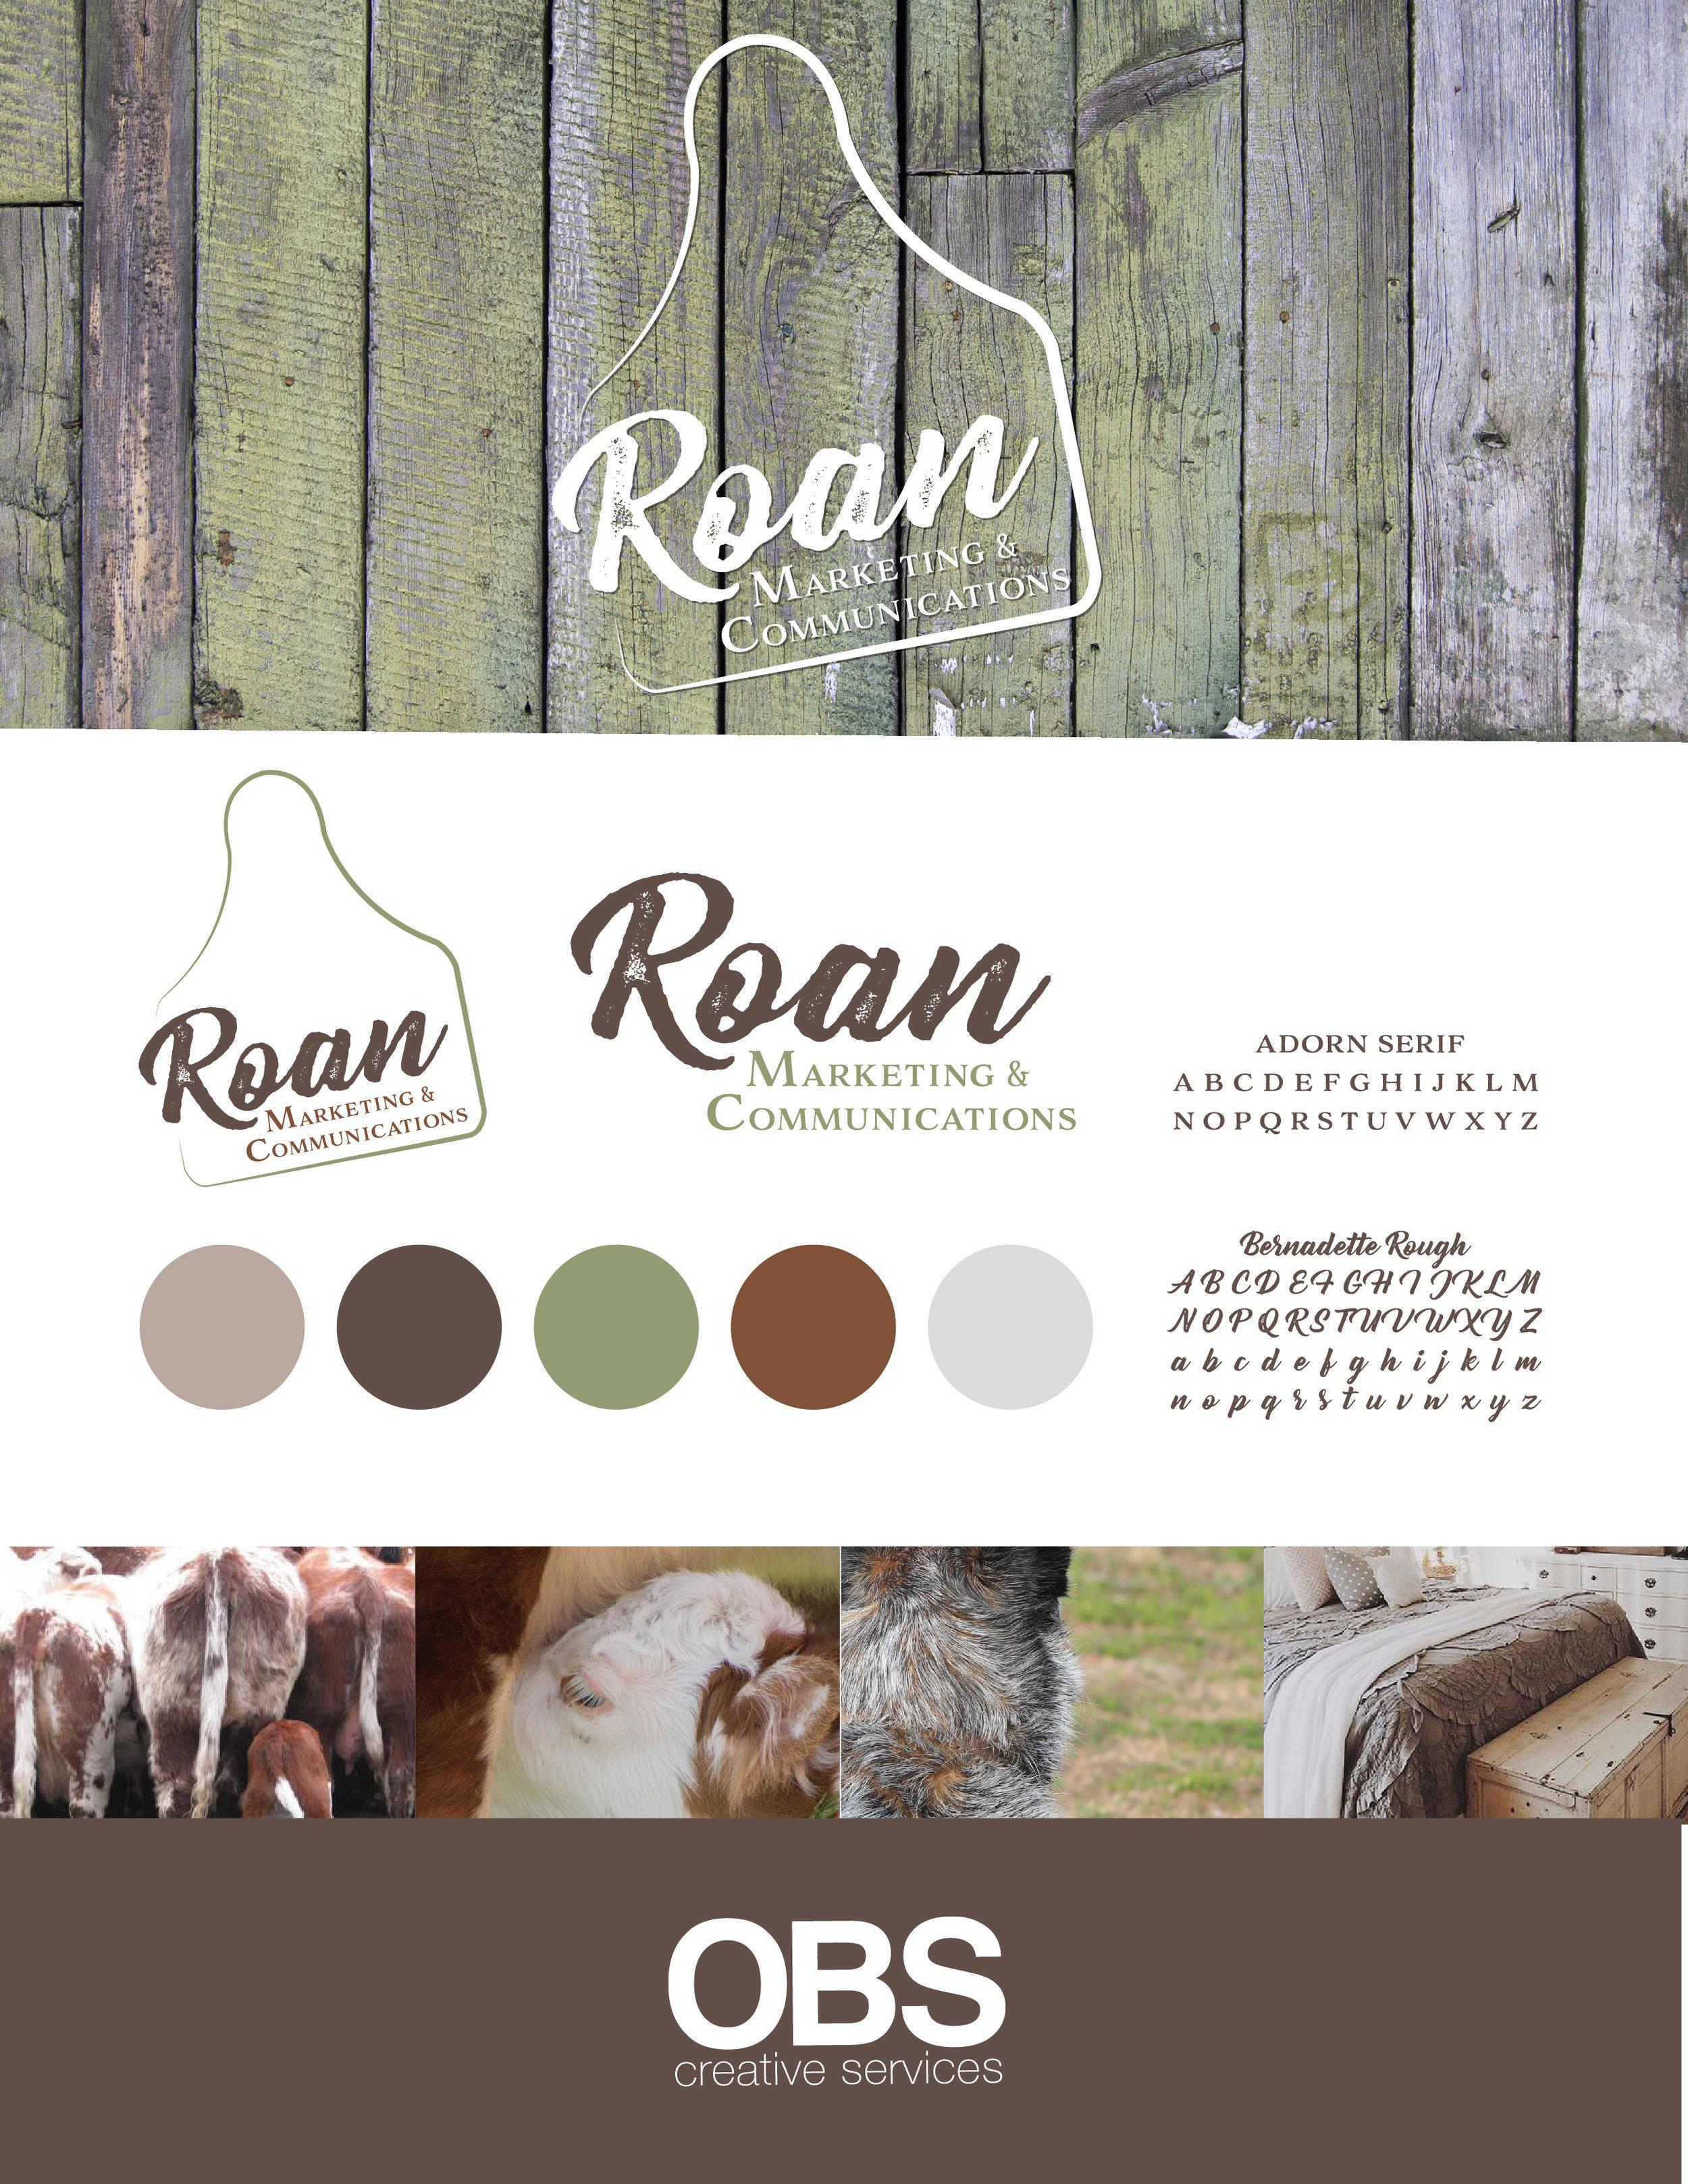 Roan Marketing & Communications.jpg